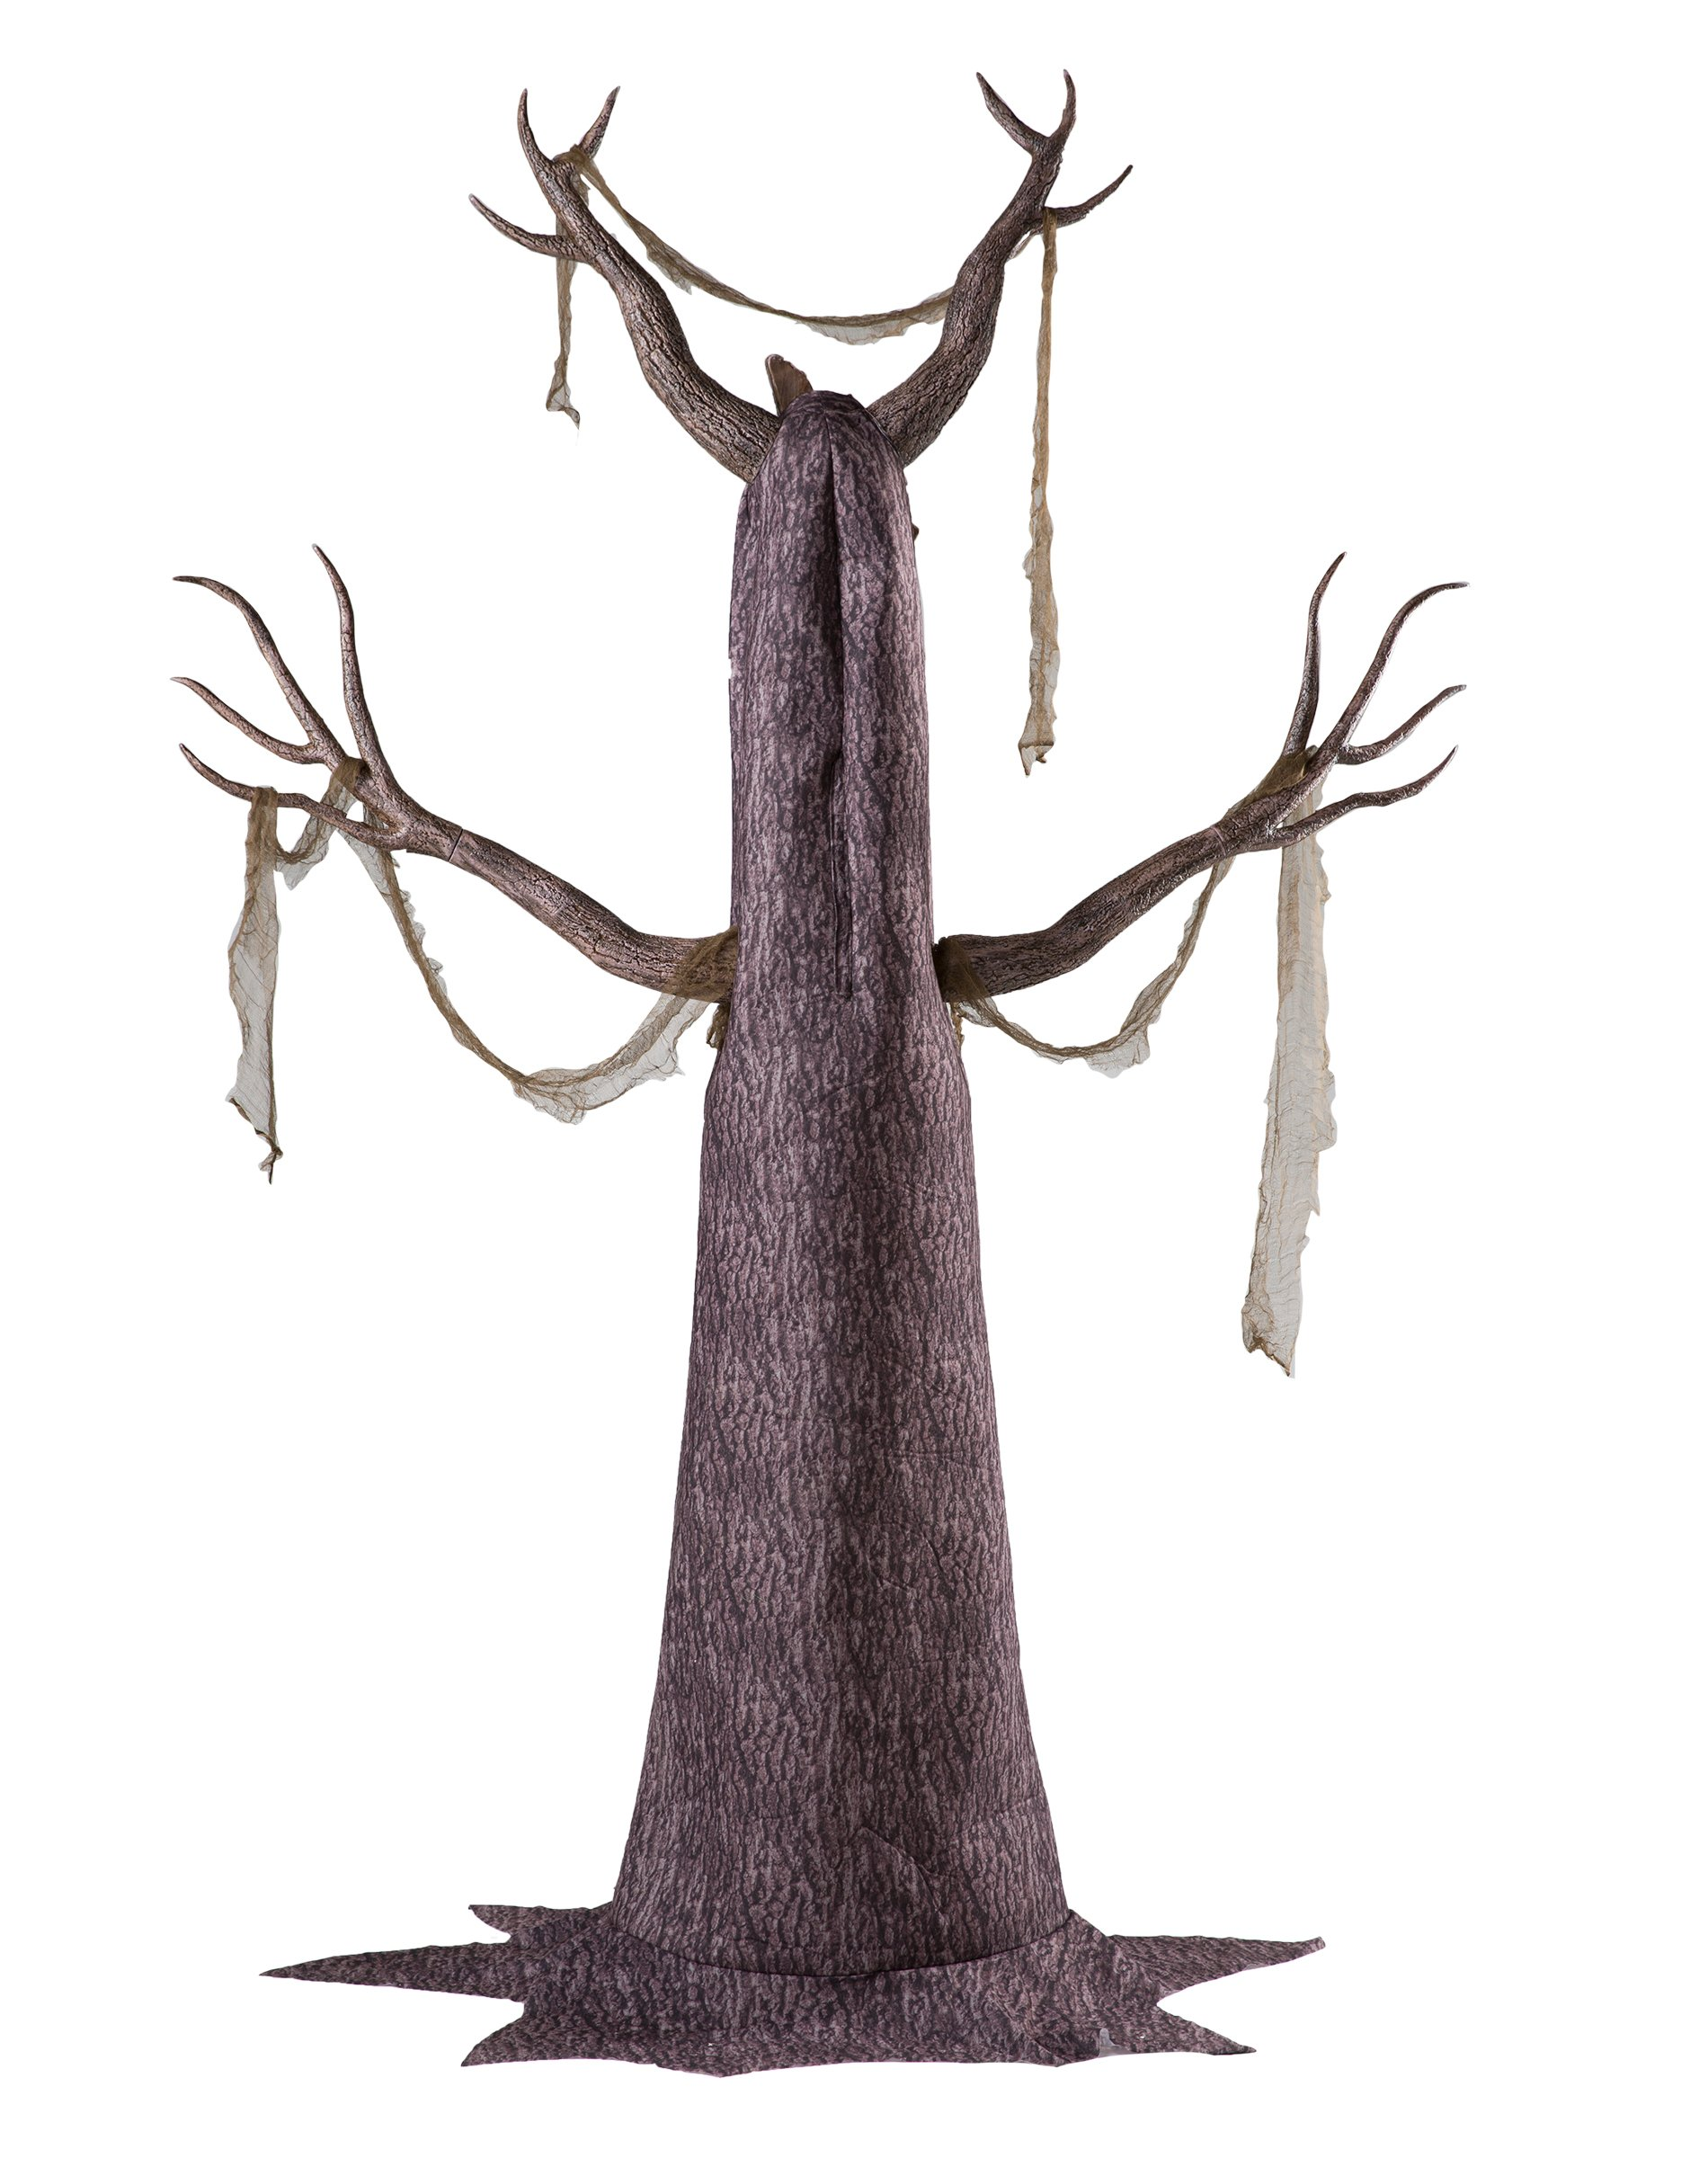 Spirit Halloween 6.5 Ft Deadly Roots Animatronics - Decorations by Spirit Halloween (Image #3)